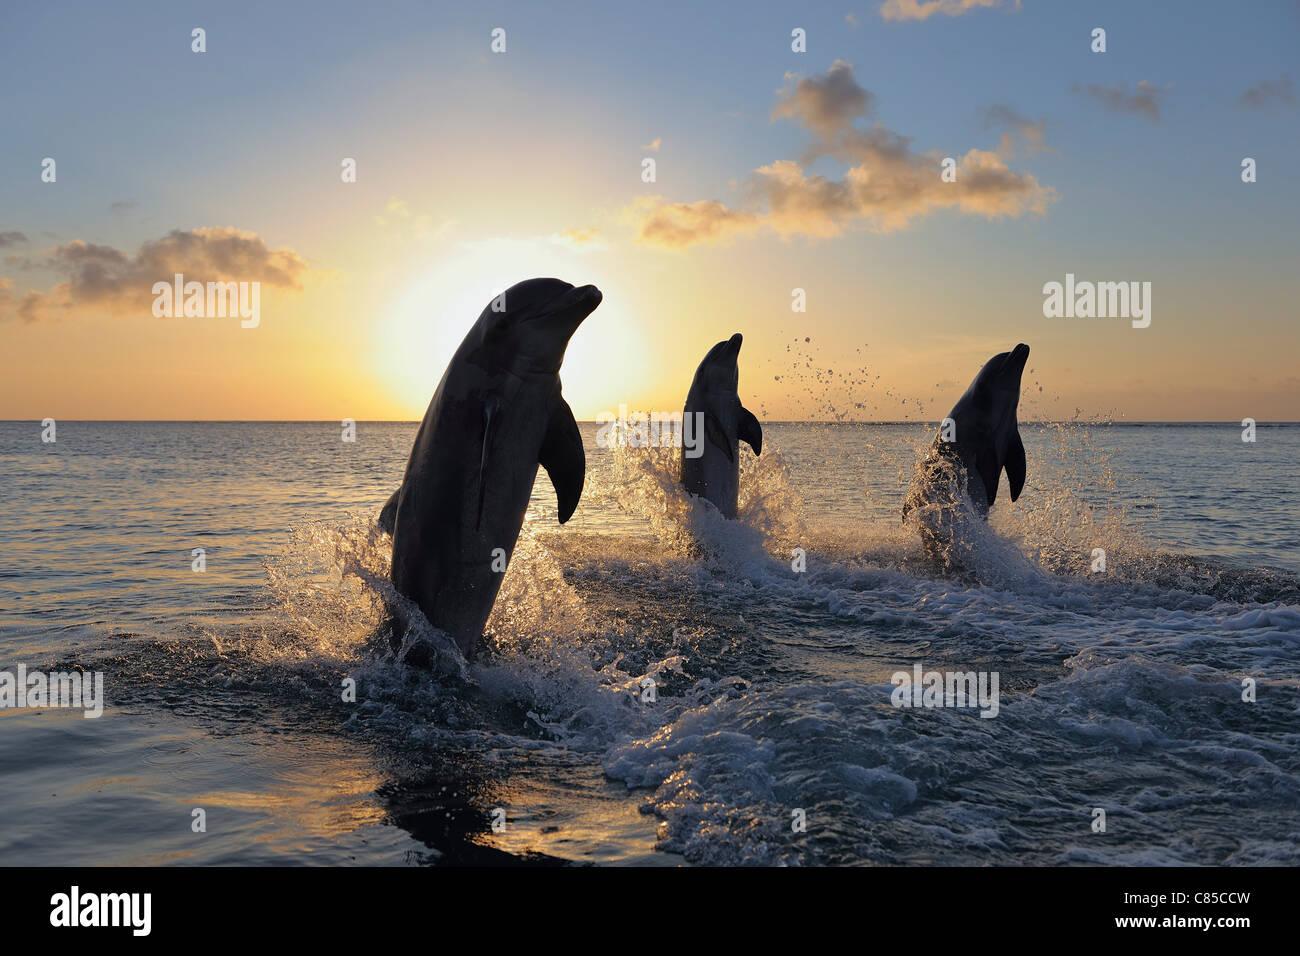 Common Bottlenose Dolphins Jumping in Sea at Sunset, Roatan, Bay Islands, Honduras Stock Photo